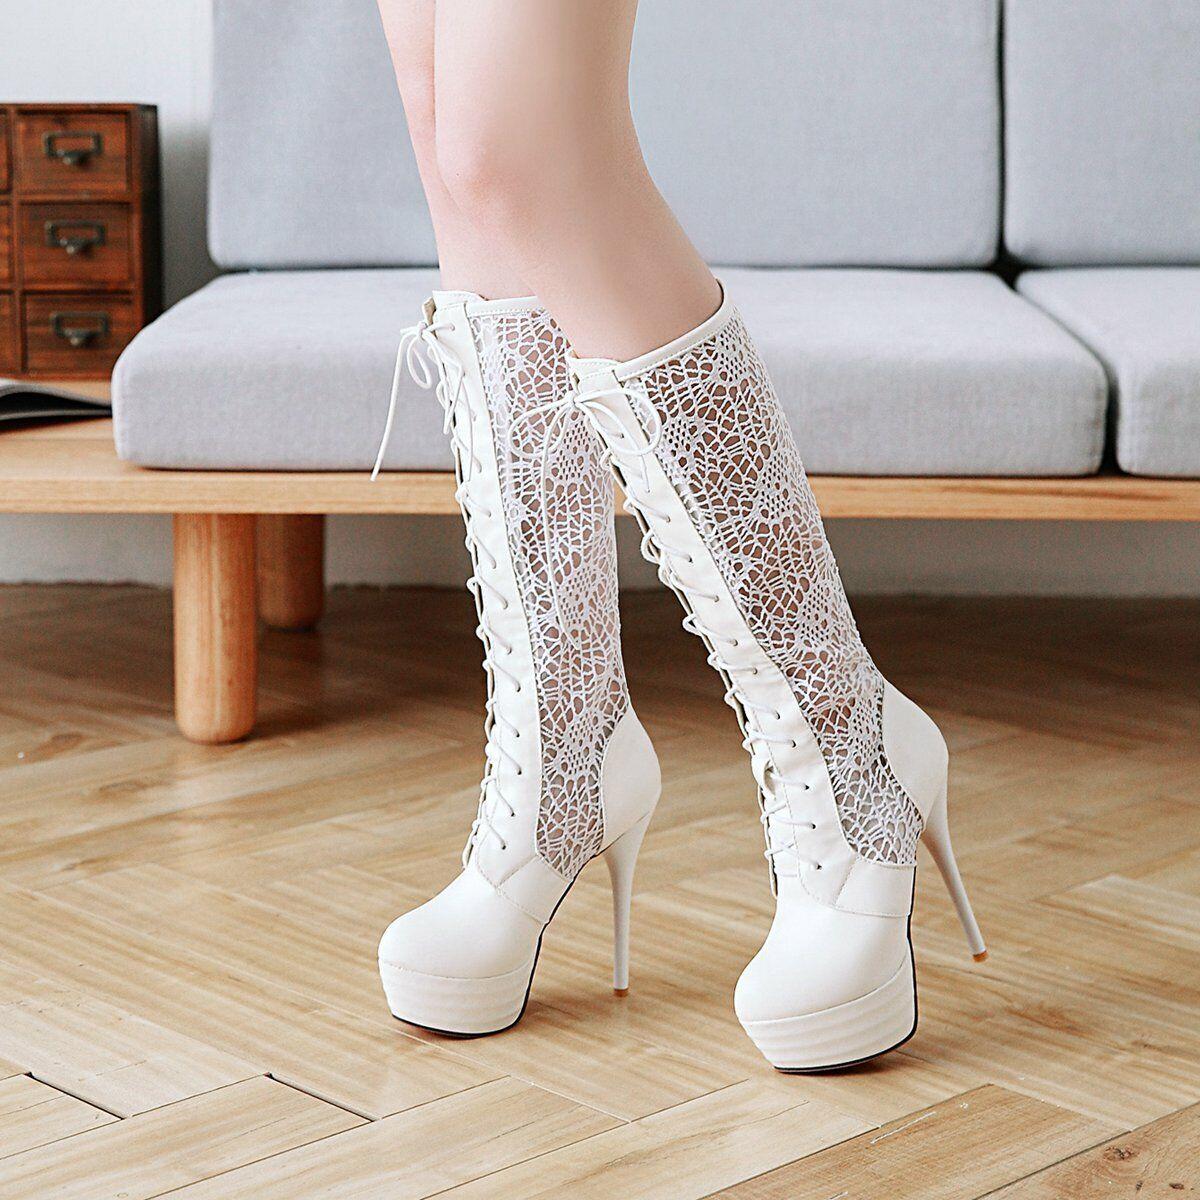 Lace Boots Pumps Women's Elegant High Heels Lace up shoes TOP New Mesh Sandals